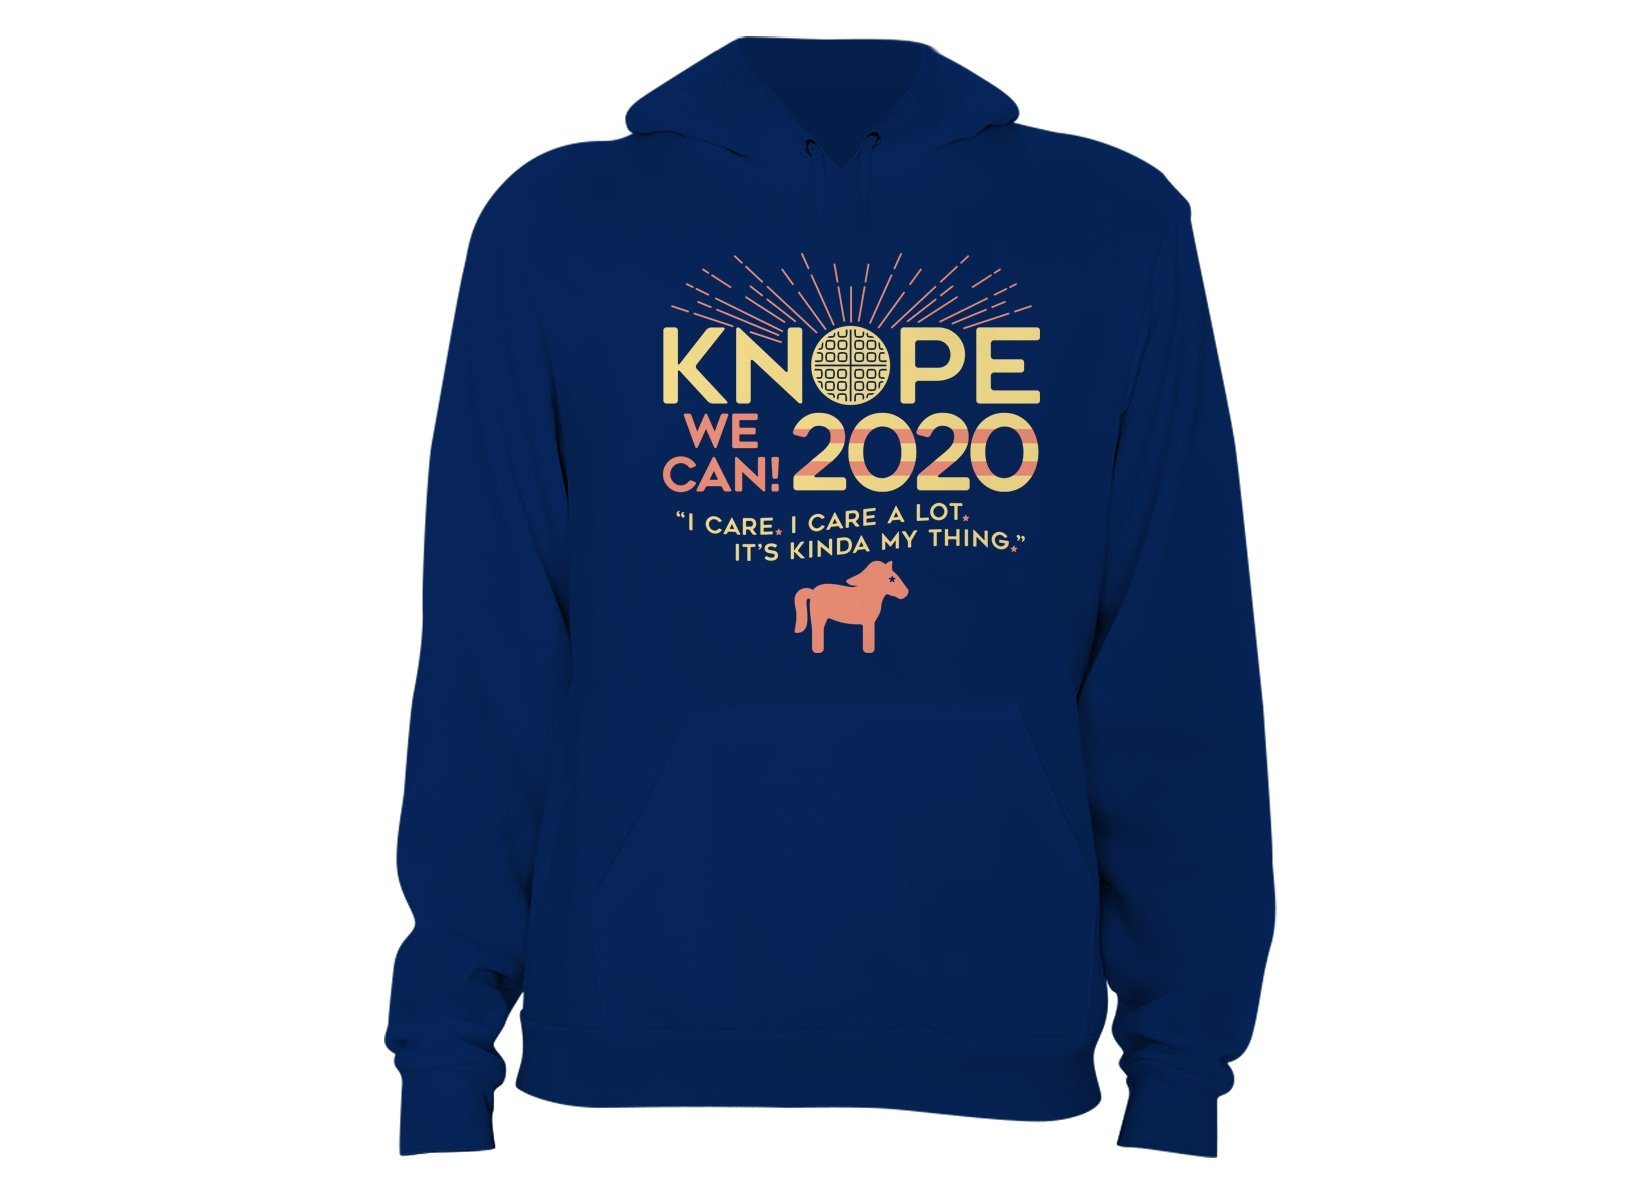 Knope 2020 on Hoodie